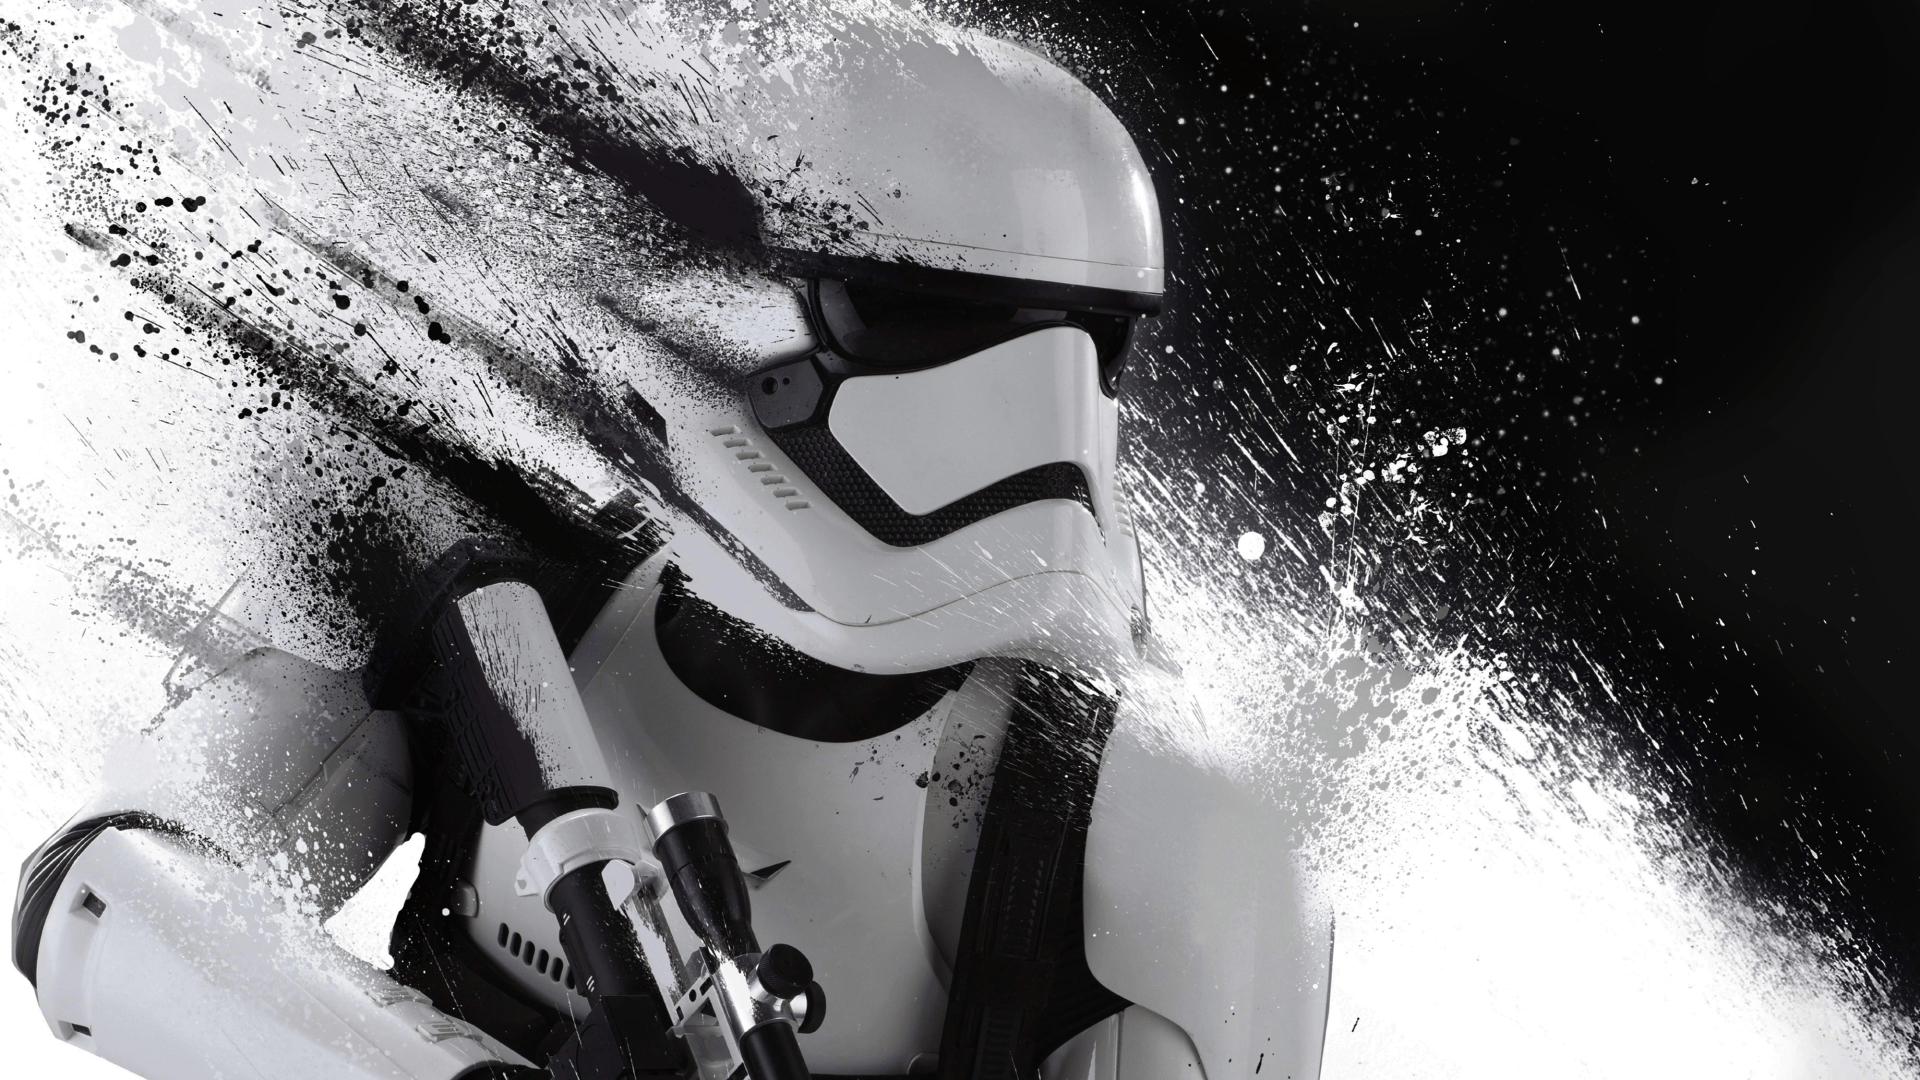 Black Stormtrooper Wallpapers Top Free Black Stormtrooper Backgrounds Wallpaperaccess